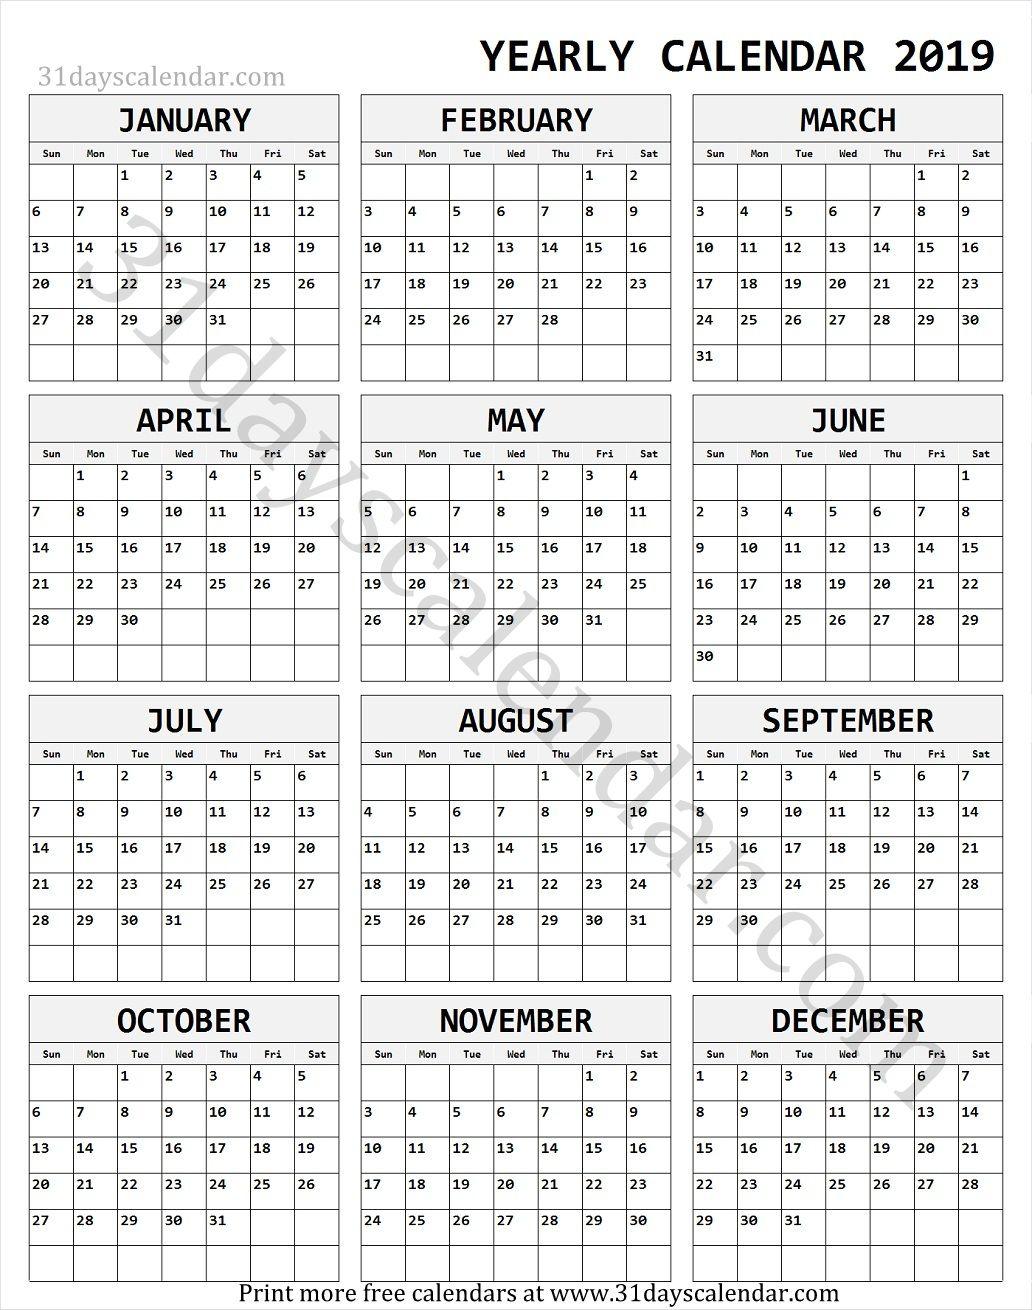 2019 Calendar Free Download   Yearly Calendar 2019